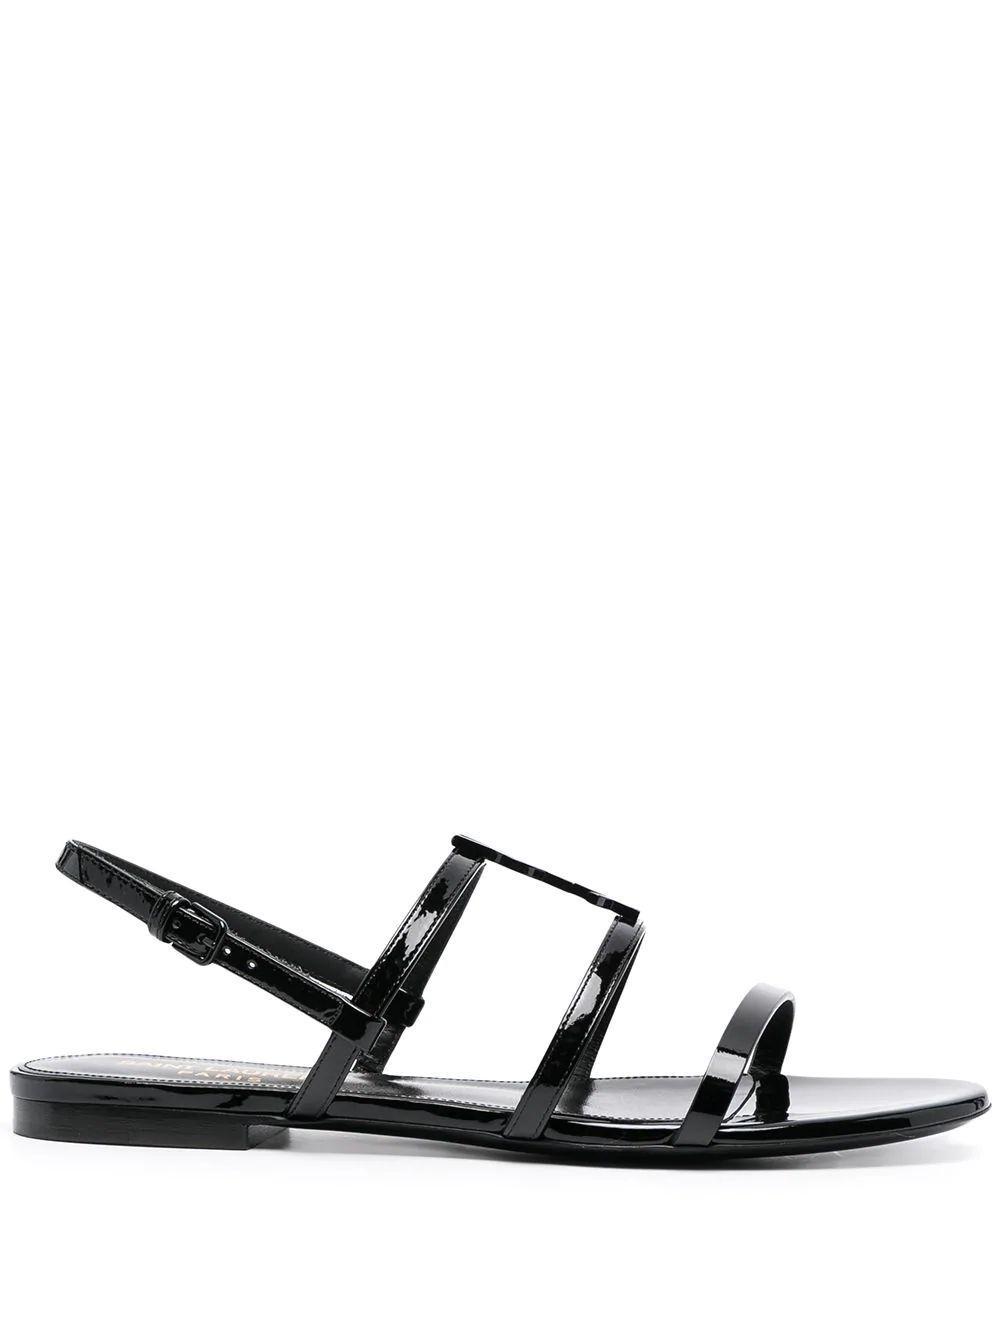 Cassandra Monogram Sandals Item # 652758B8IVV